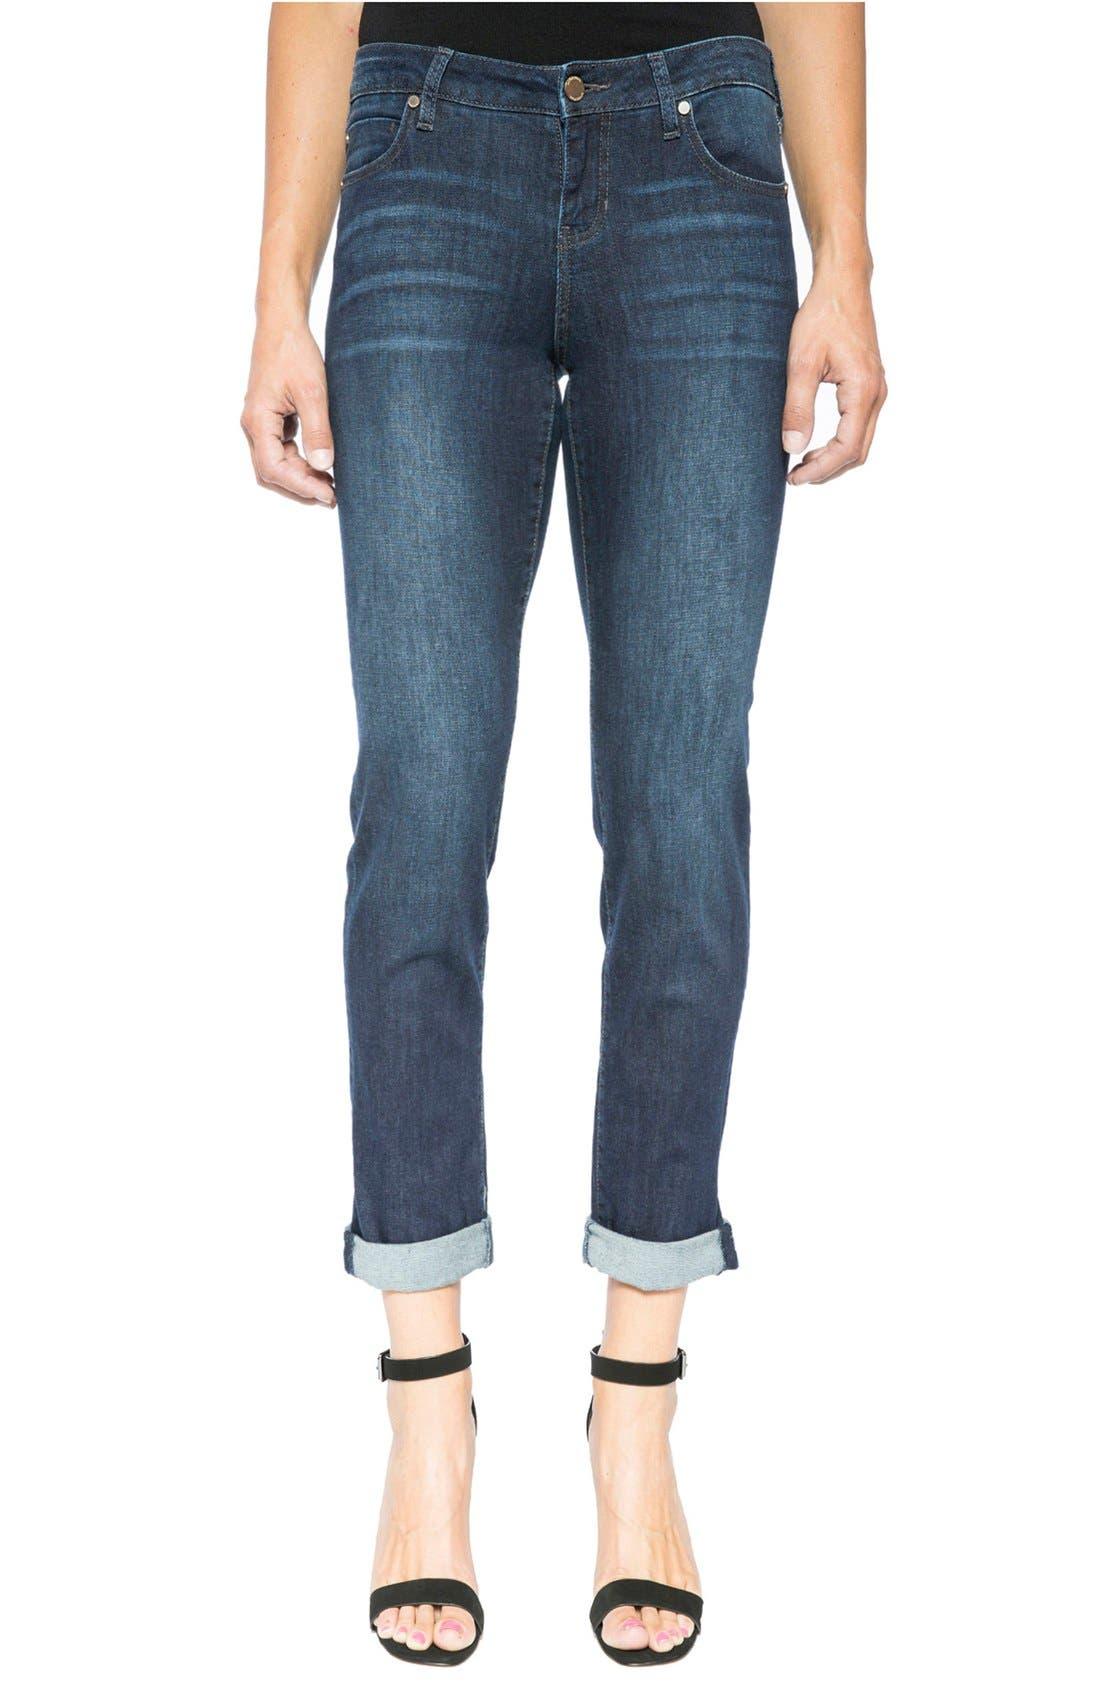 Liverpool Jeans Company Peyton Slim Stretch Crop Boyfriend Jeans (Vintage Super Dark)